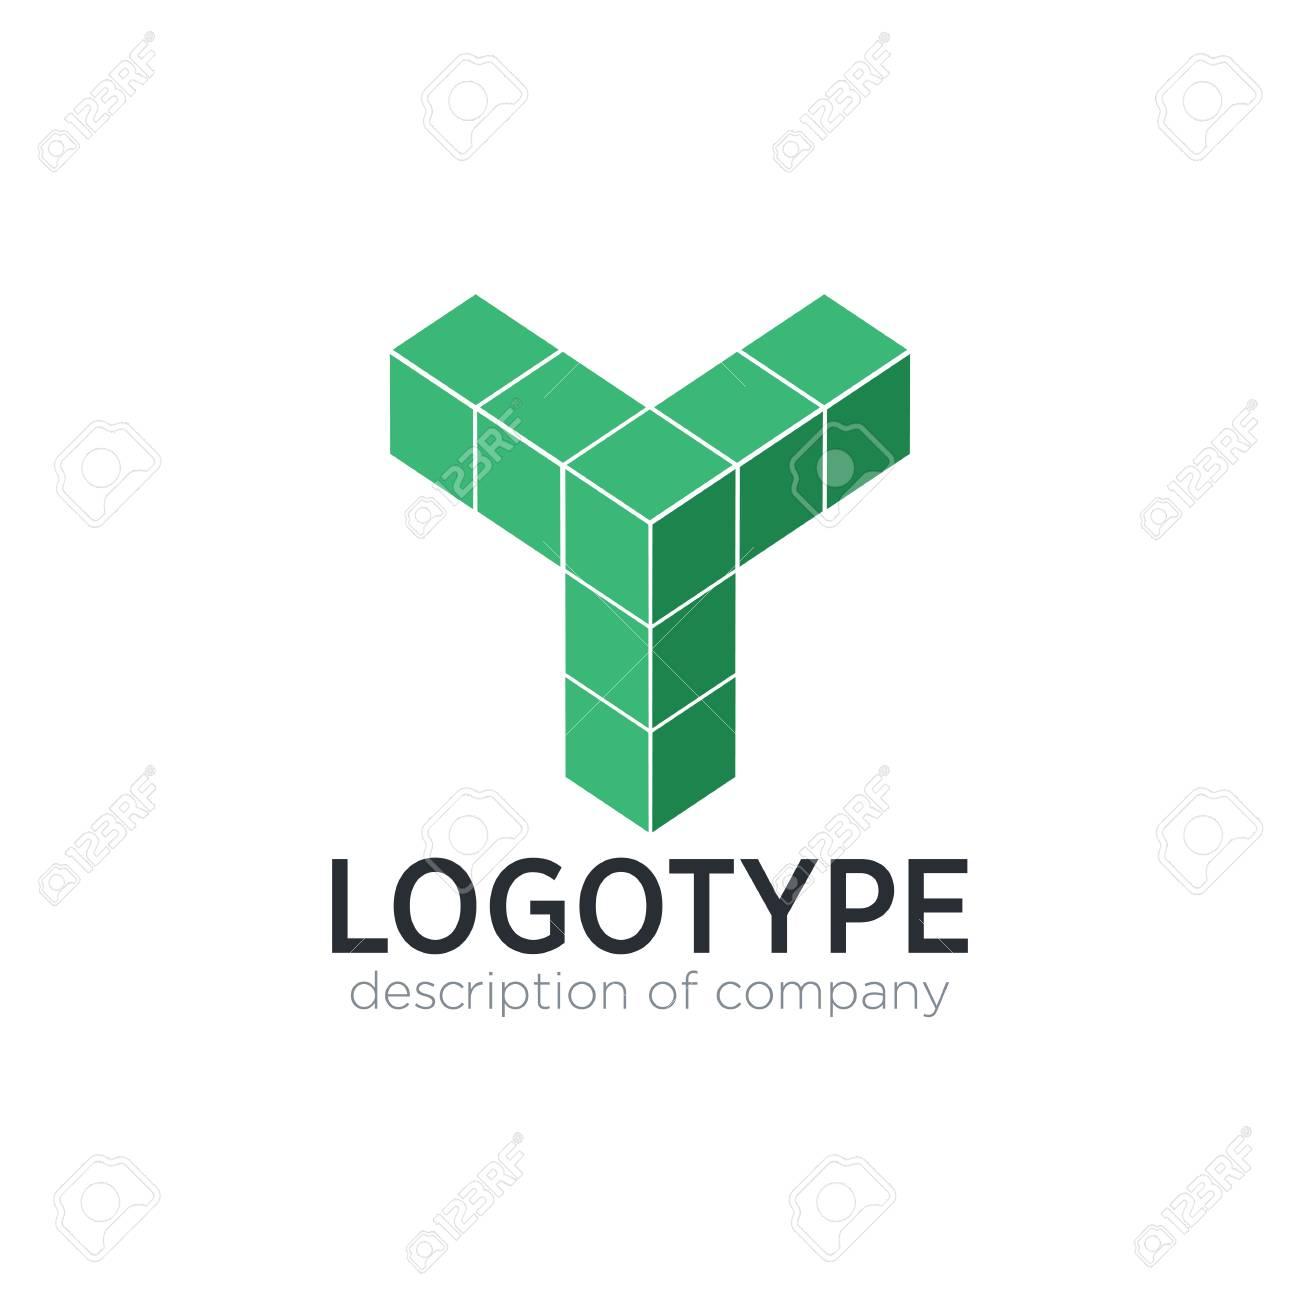 Letter y cube figure logo icon design template elements royalty free letter y cube figure logo icon design template elements stock vector 83859823 maxwellsz